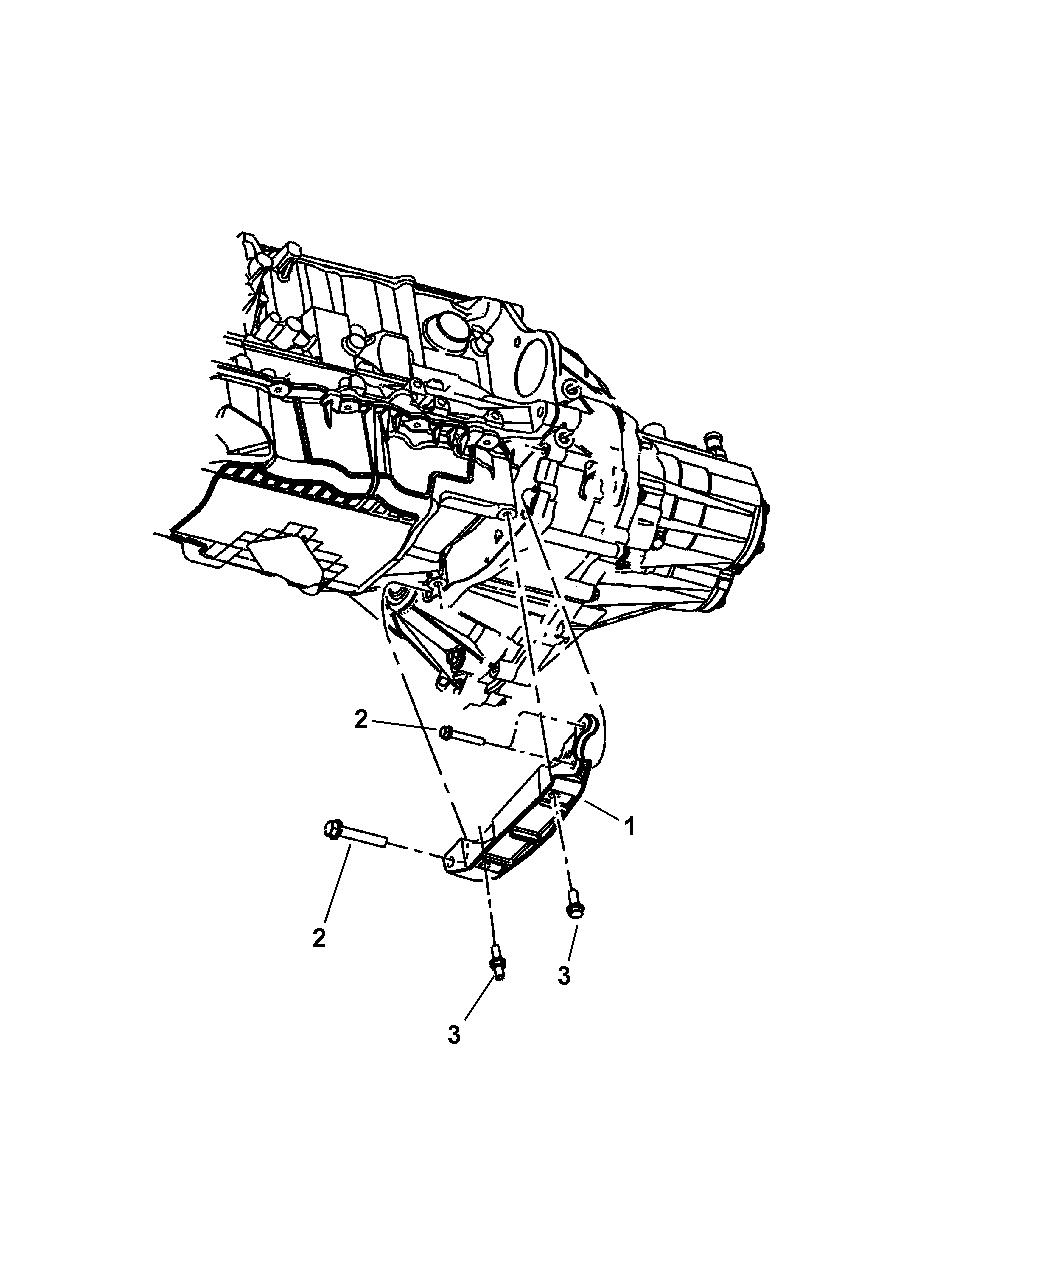 Chrysler Pt Cruiser Structural Collar Of Manual